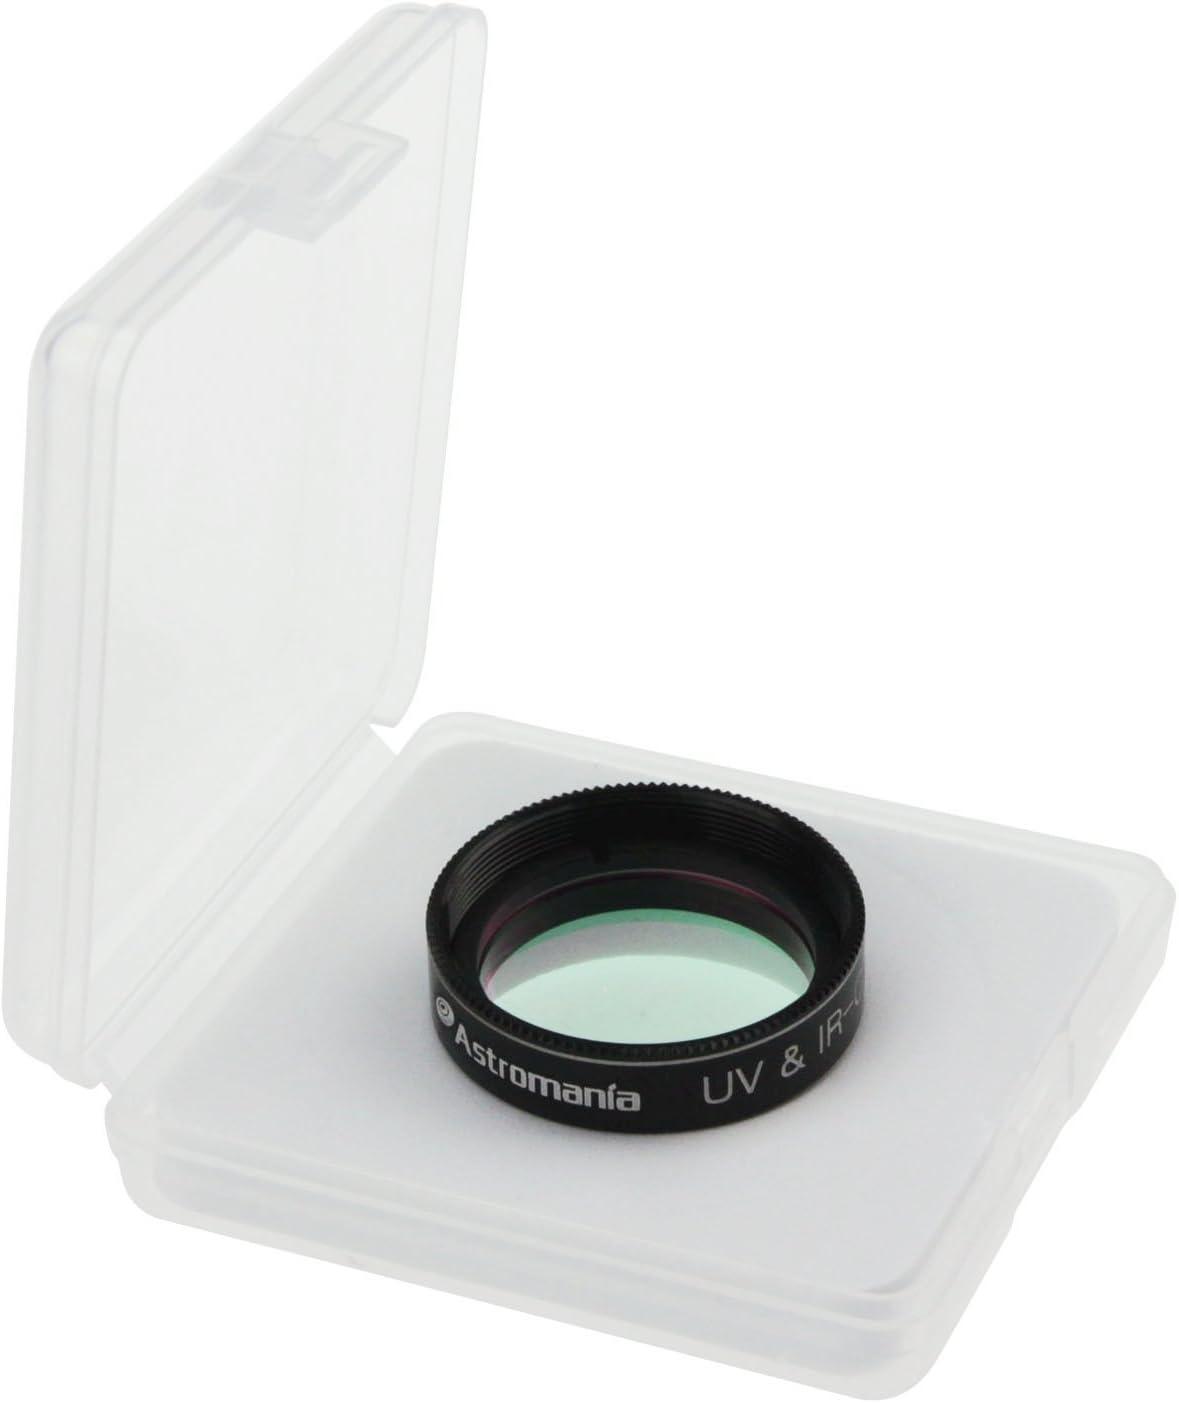 Keeps Your Planetary Images Sharp Astromania 1.25 IR//UV Blocking Filter